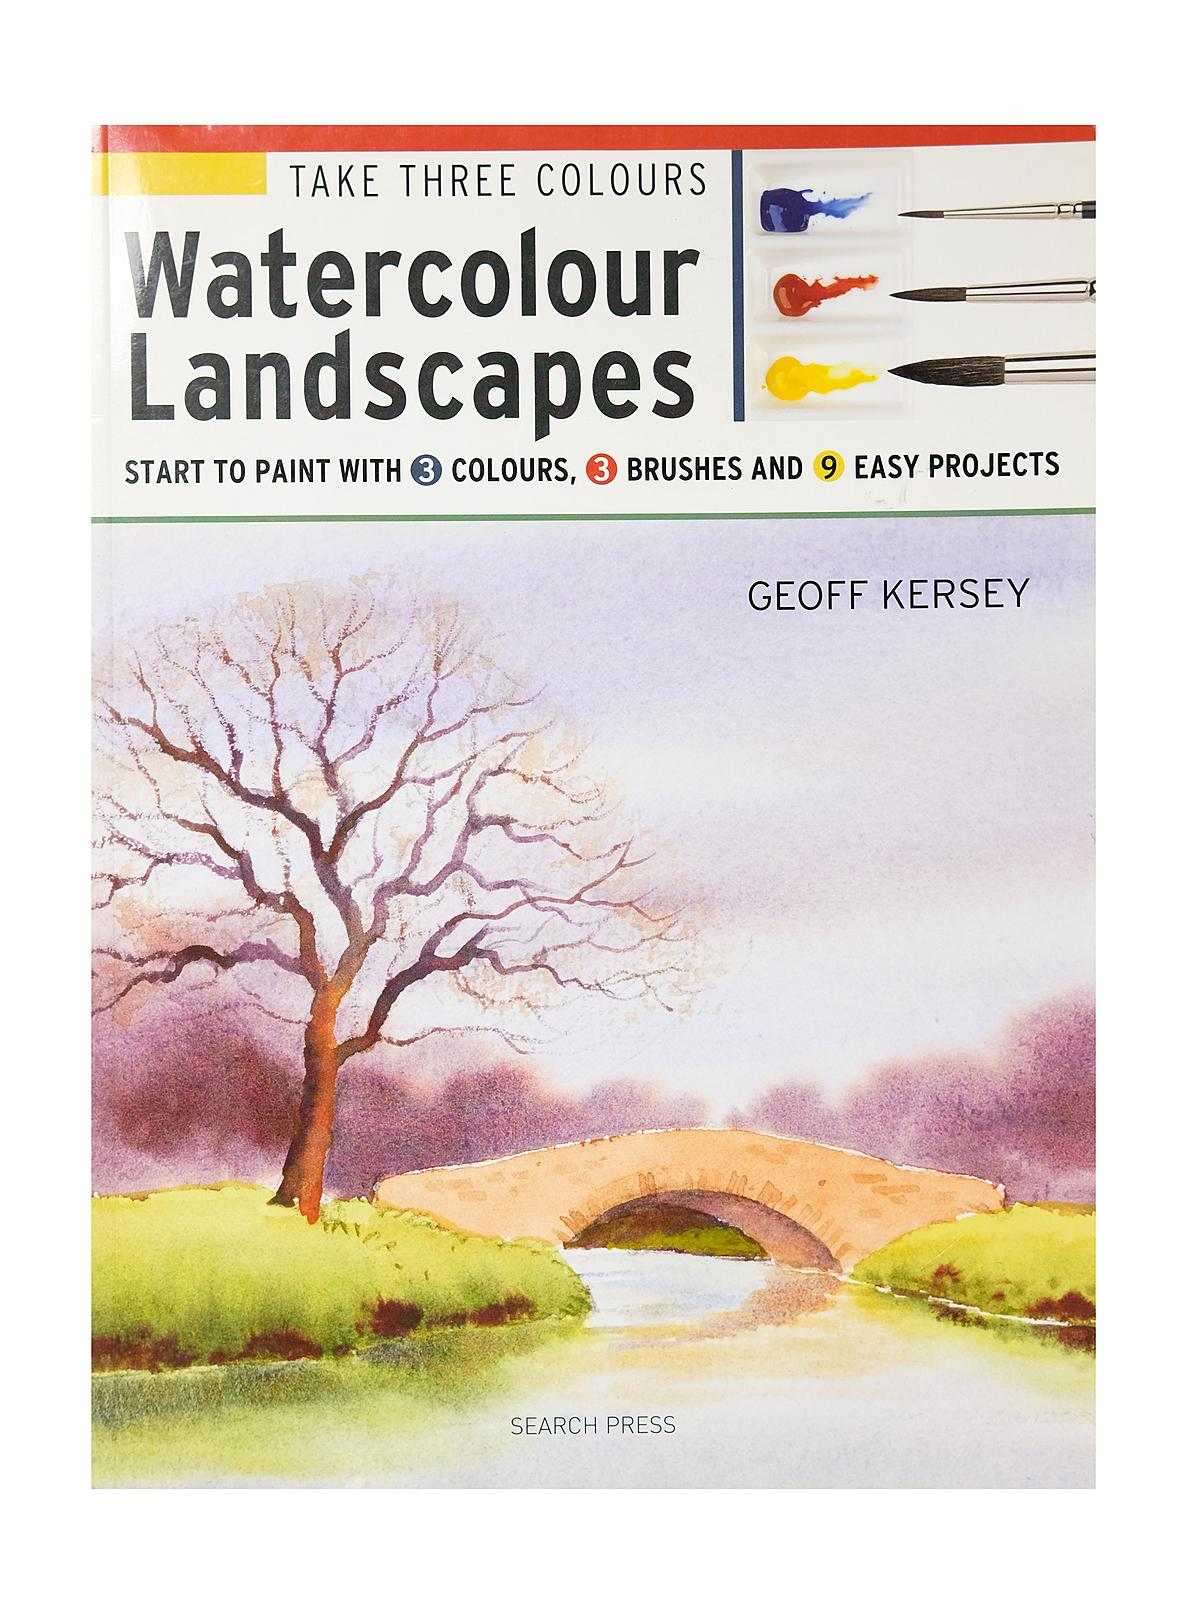 Search Press - Take Three Colours Series